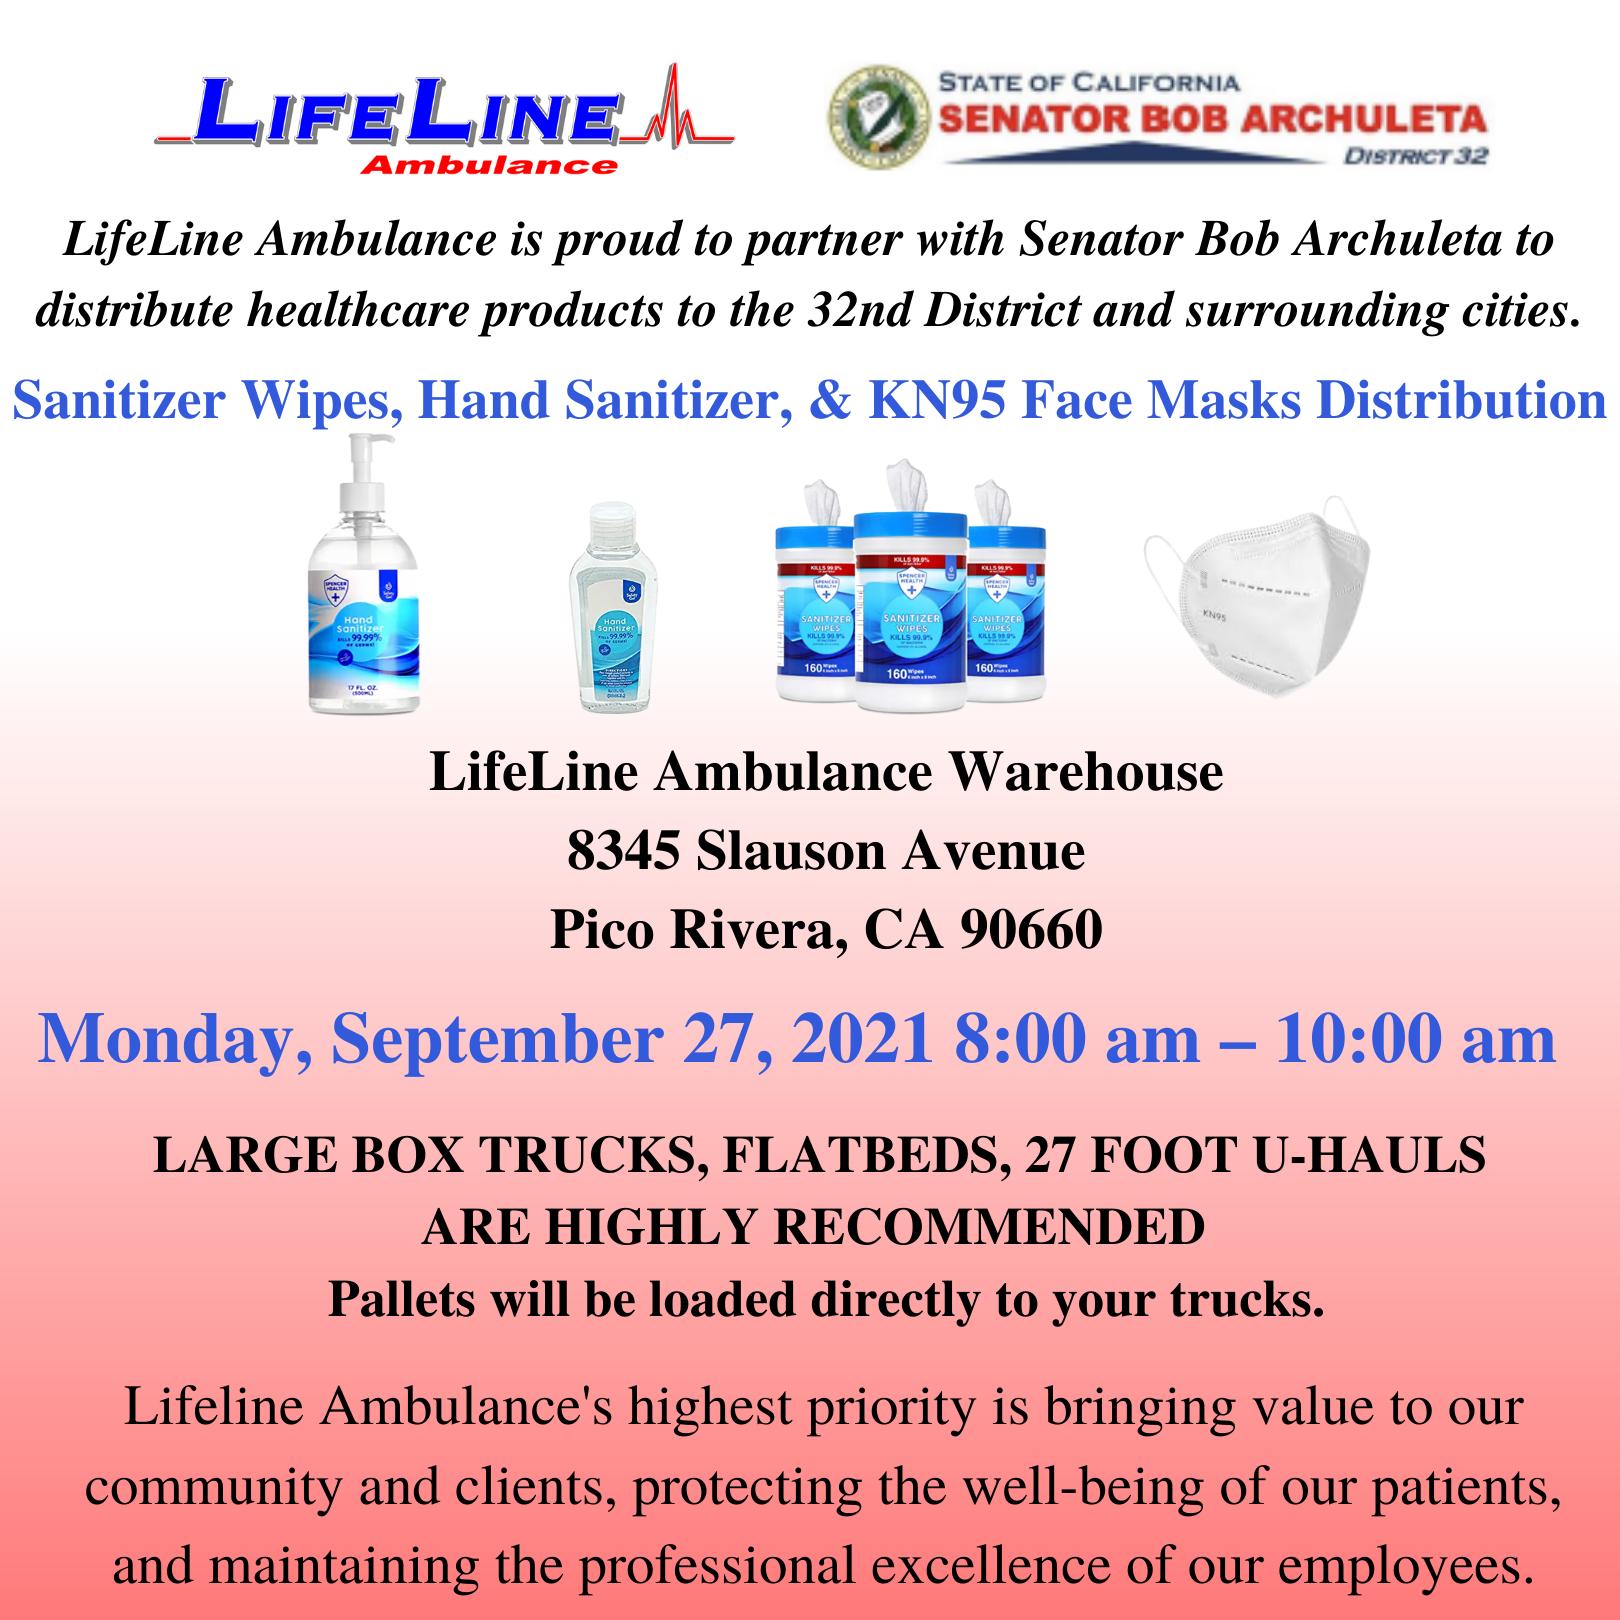 LifeLine CEO Maxim Gorin Partnered With Senator Bob Archuleta Providing PPE To California Establishments